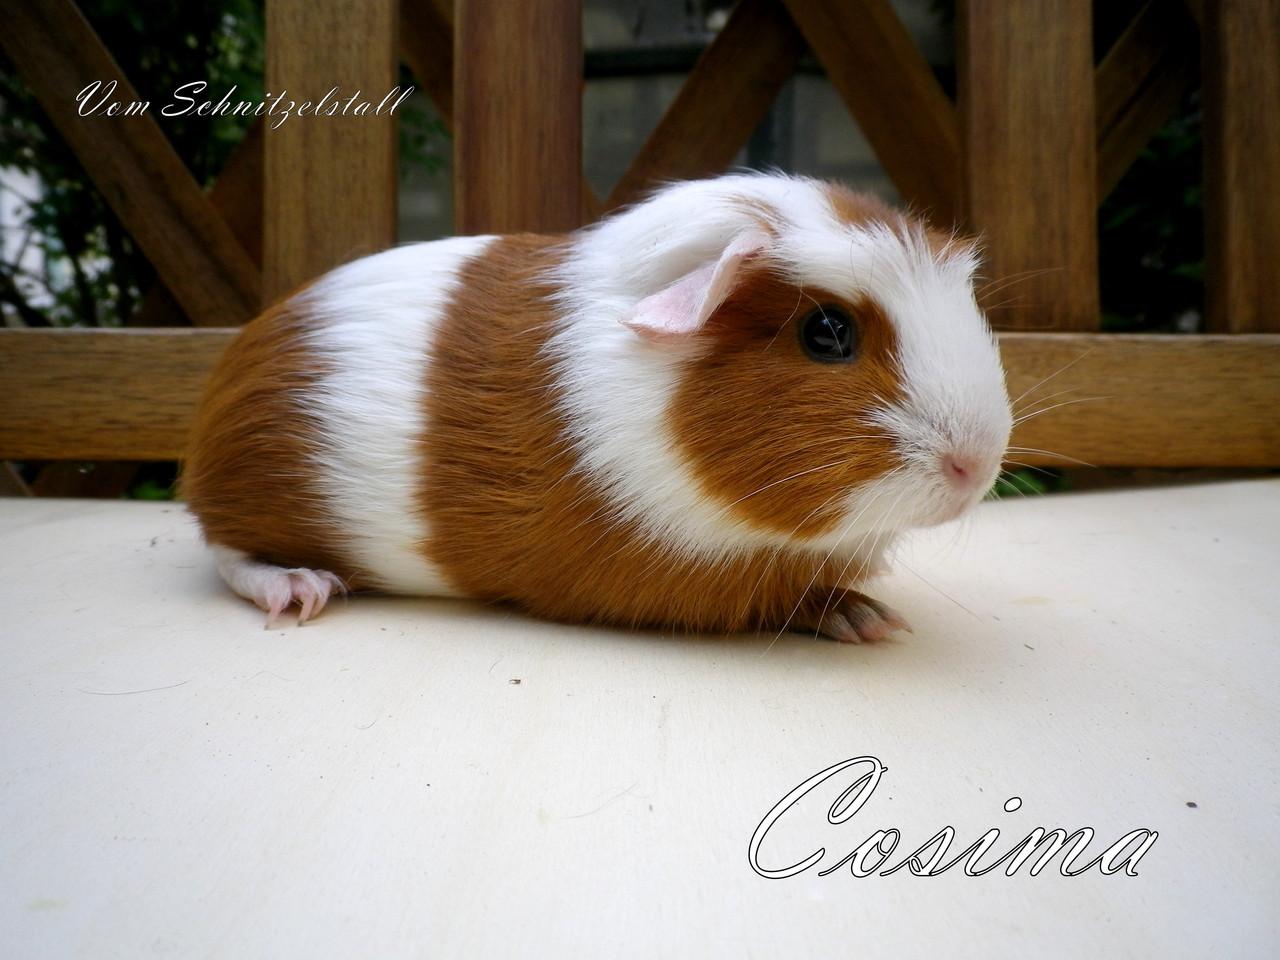 Cosima vom Schnitzelstall